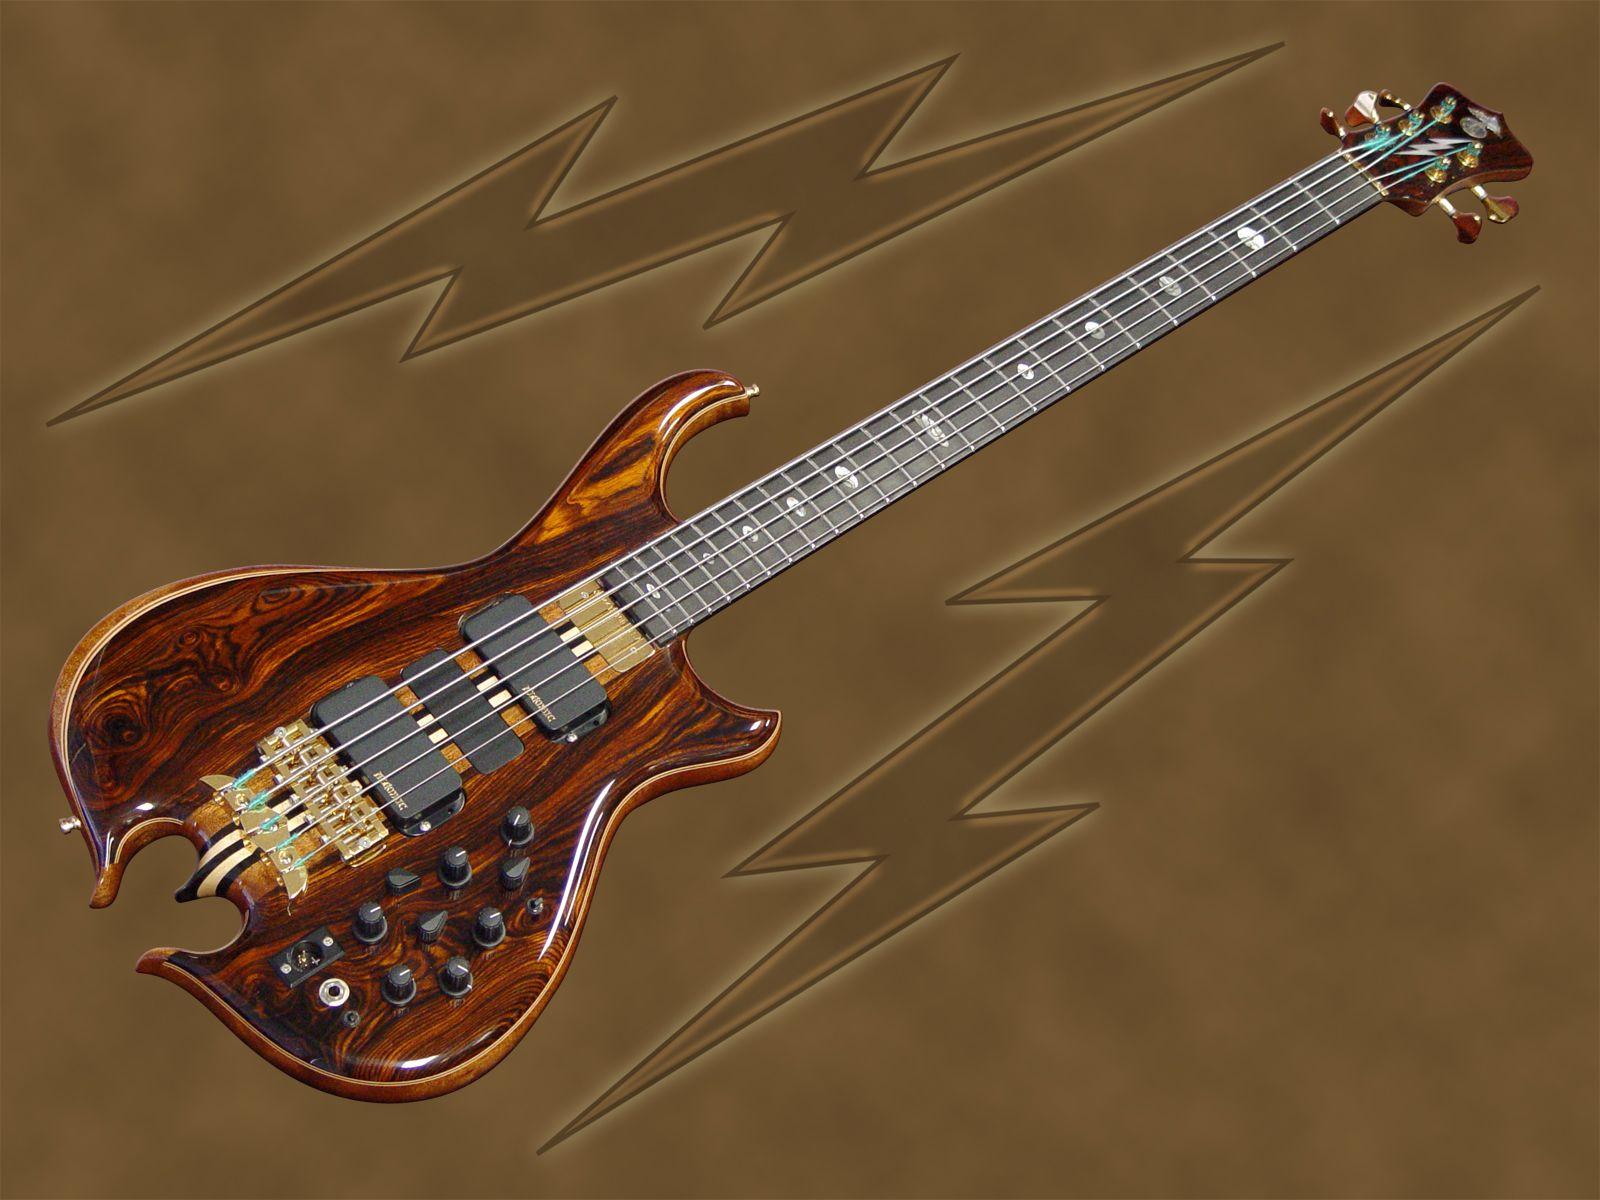 30 2013 music guitar background 1600 x 1200 id